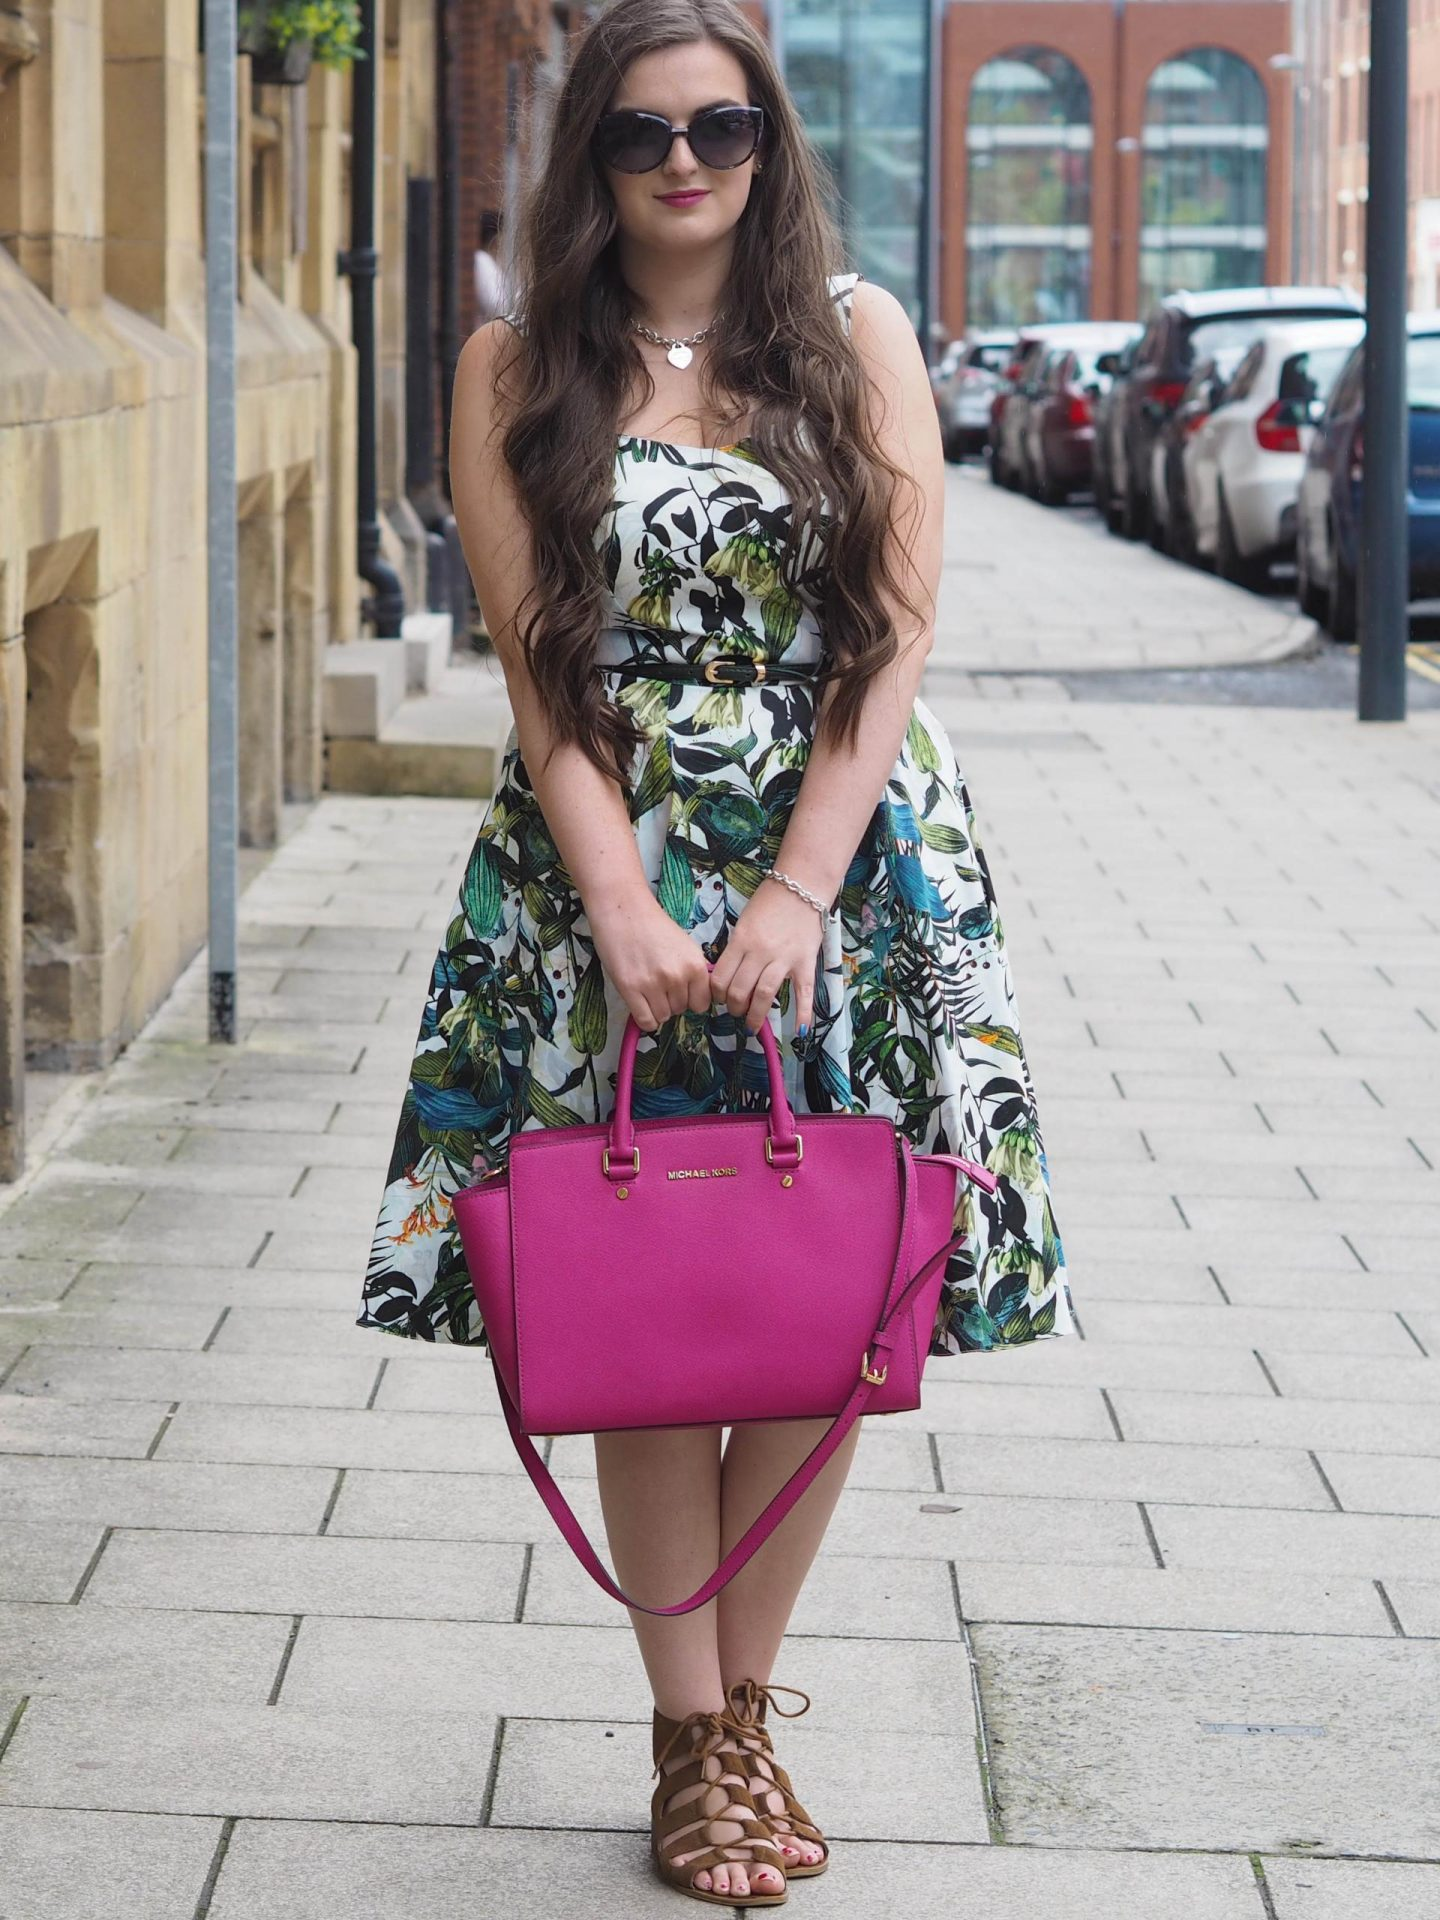 Ladies Who Brunch, Closet London - Rachel Nicole UK Fashion Blogger 2